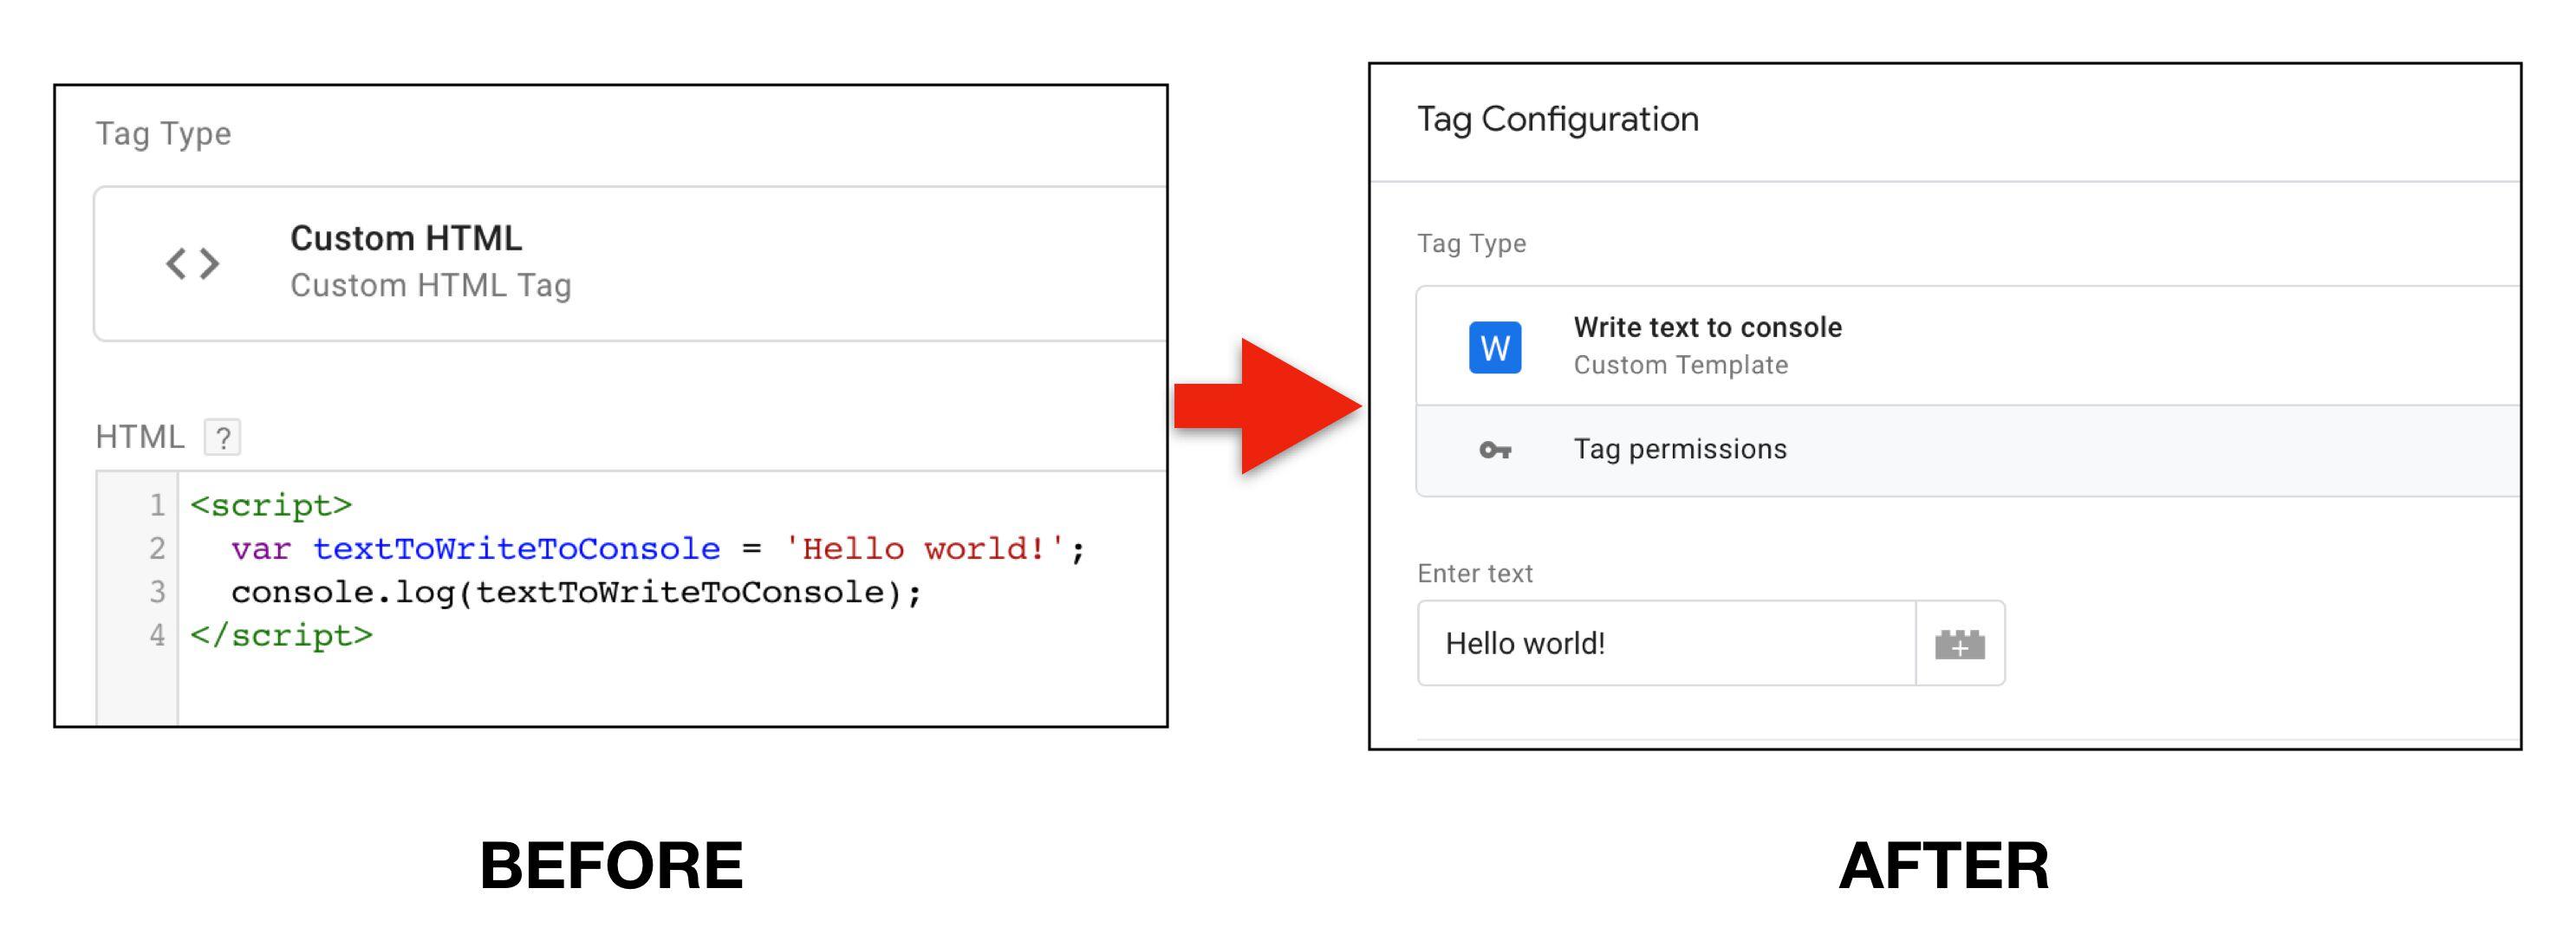 Custom Templates Guide For Google Tag Manager | Simo Ahava's blog